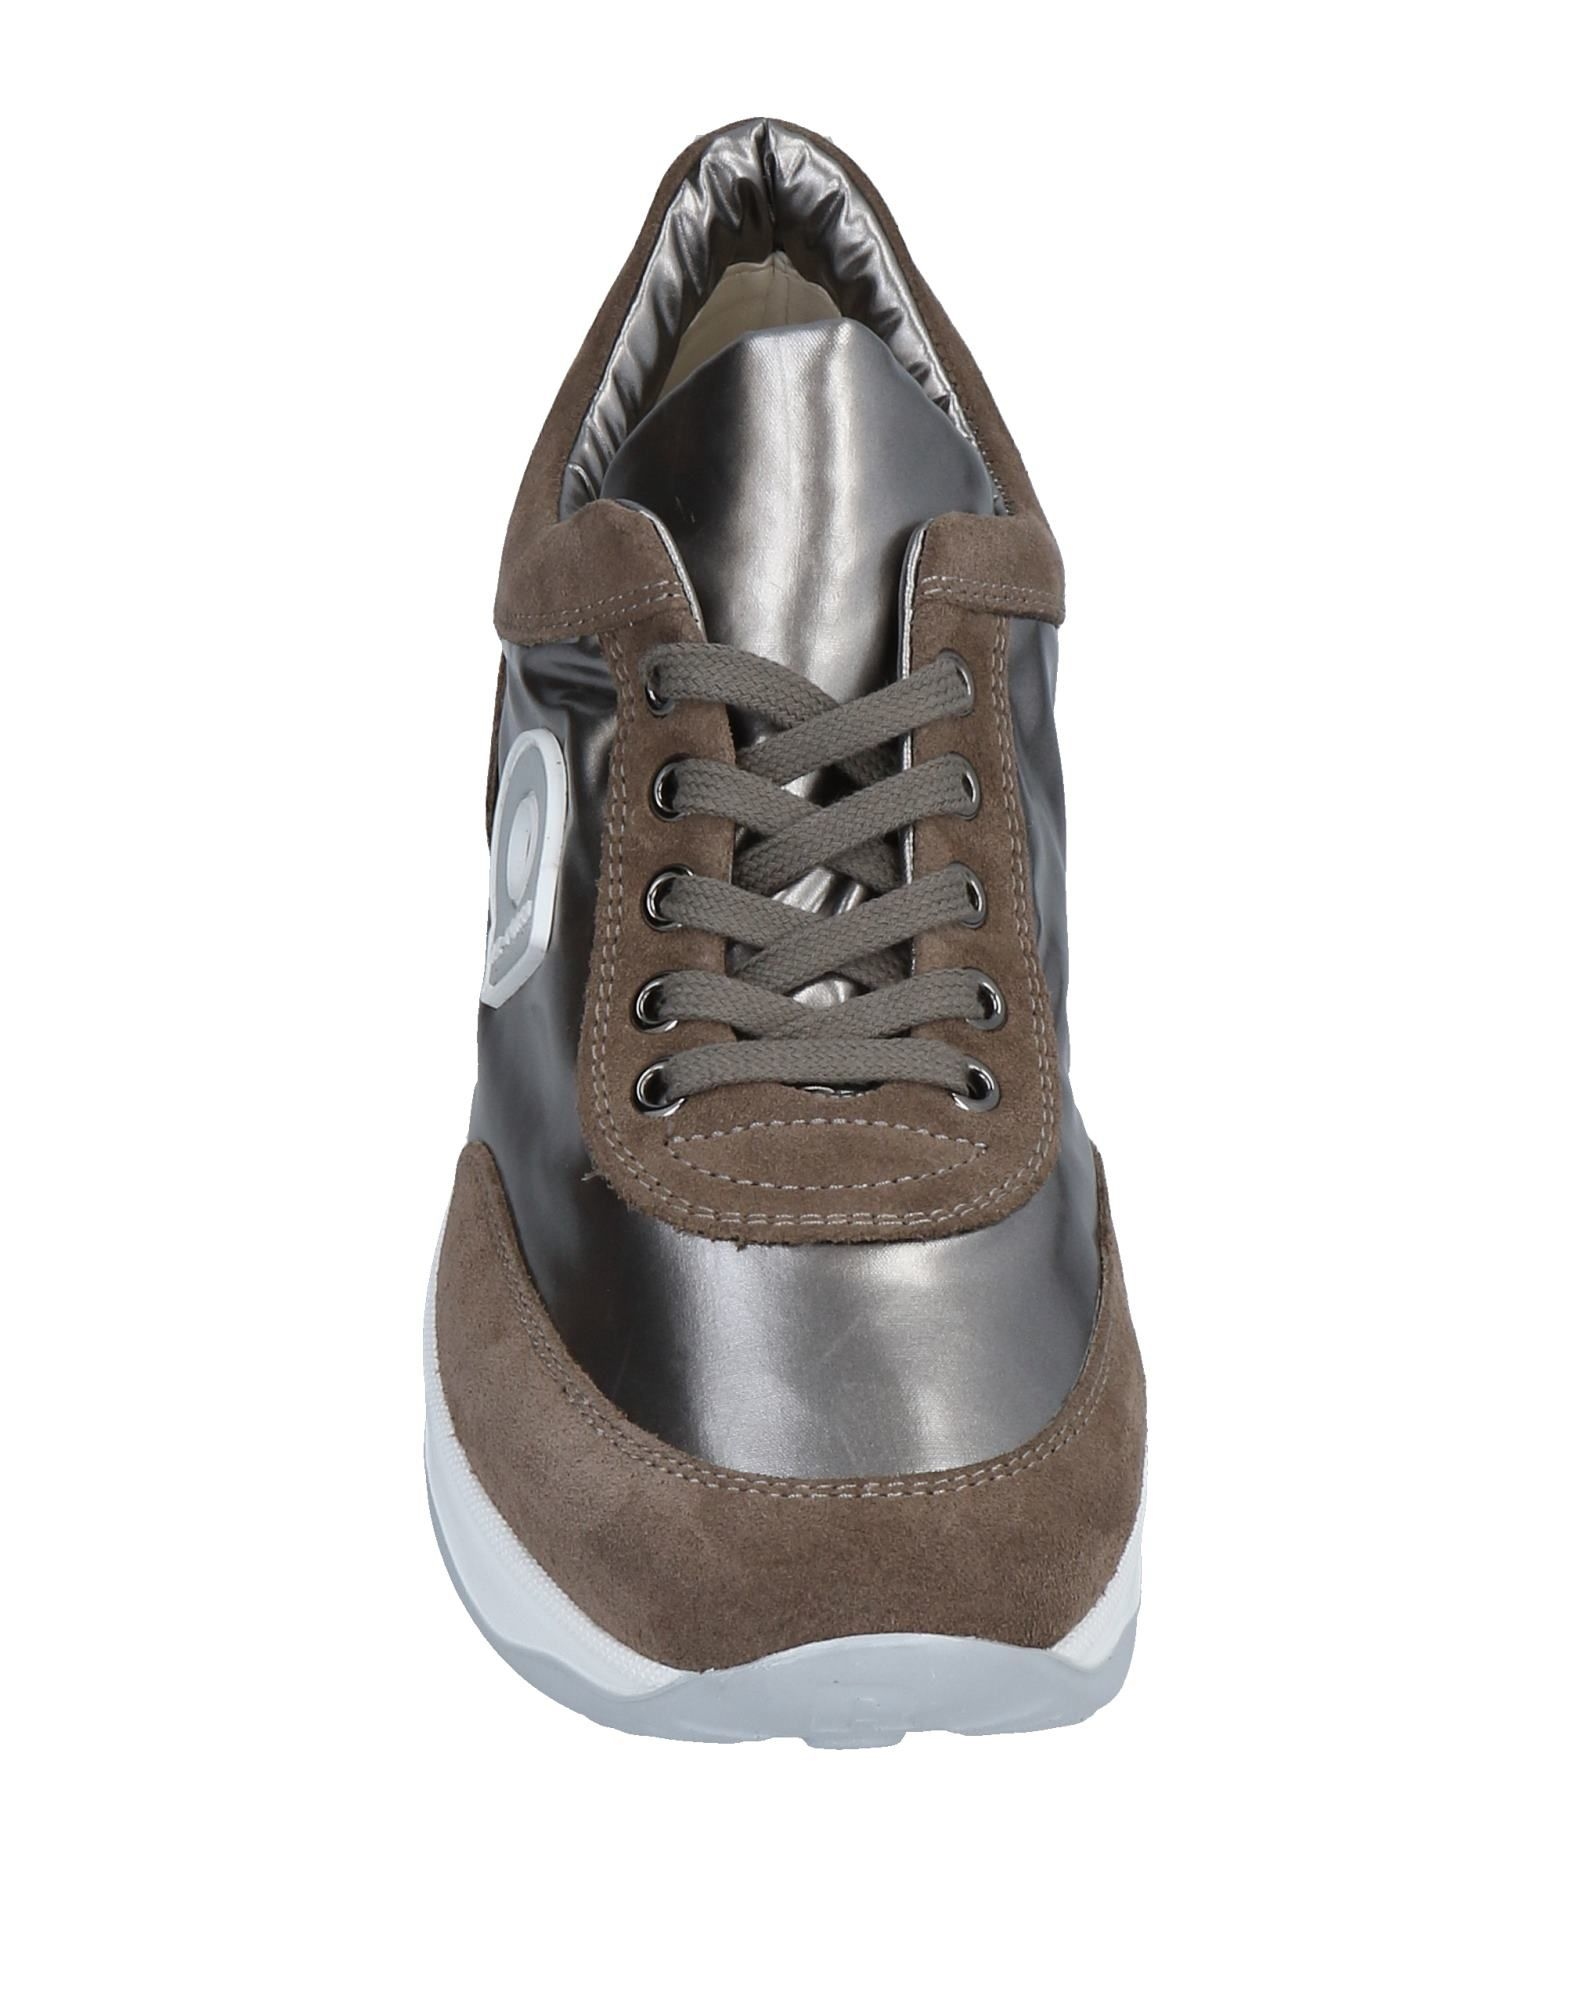 Agile By Rucoline Neue Sneakers Damen  11496709AD Neue Rucoline Schuhe eb24ed